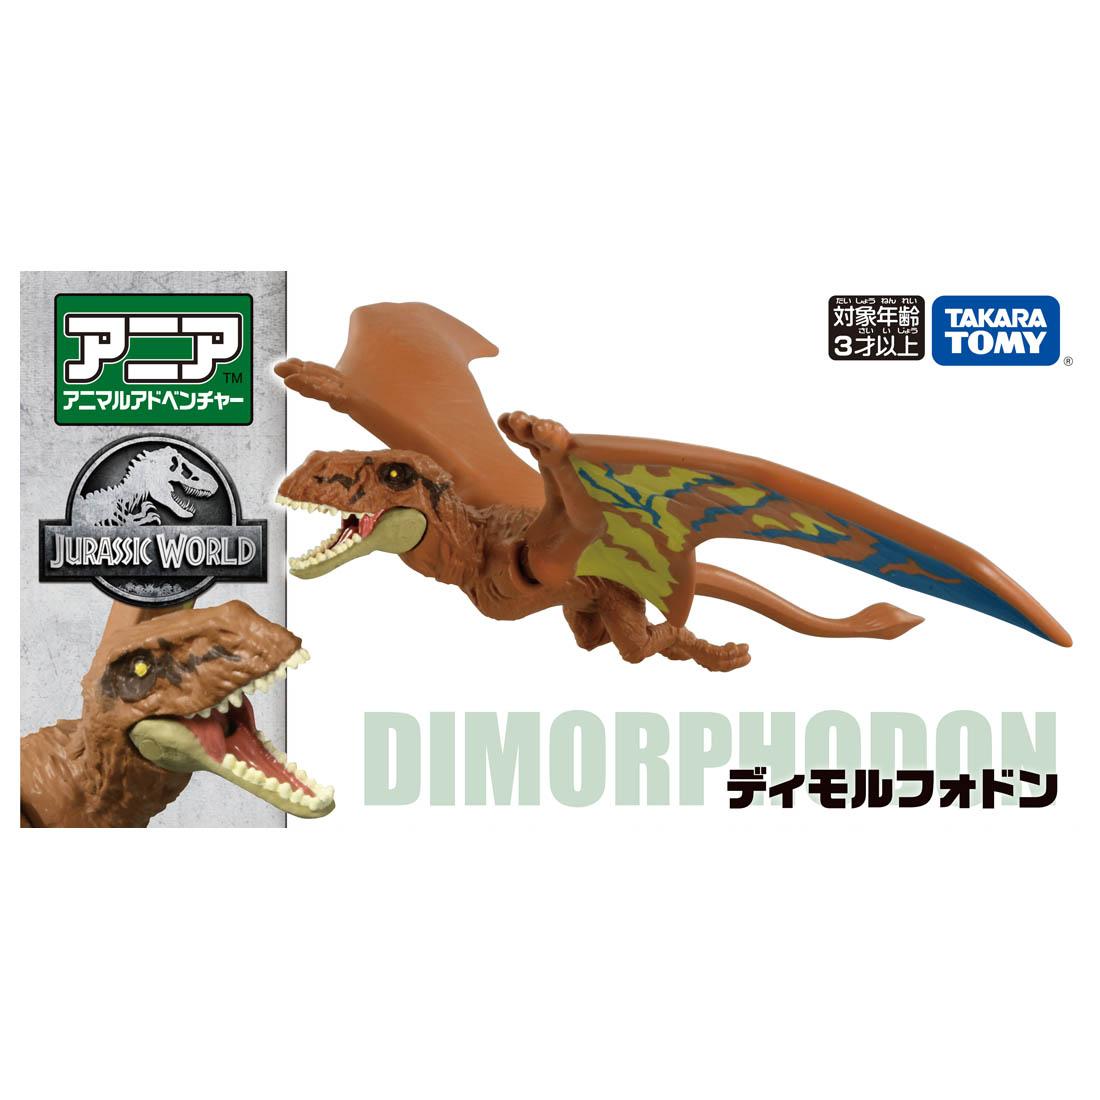 《TAKARA TOMY》多美動物ANIA 侏儸紀世界-雙型齒翼龍 東喬精品百貨